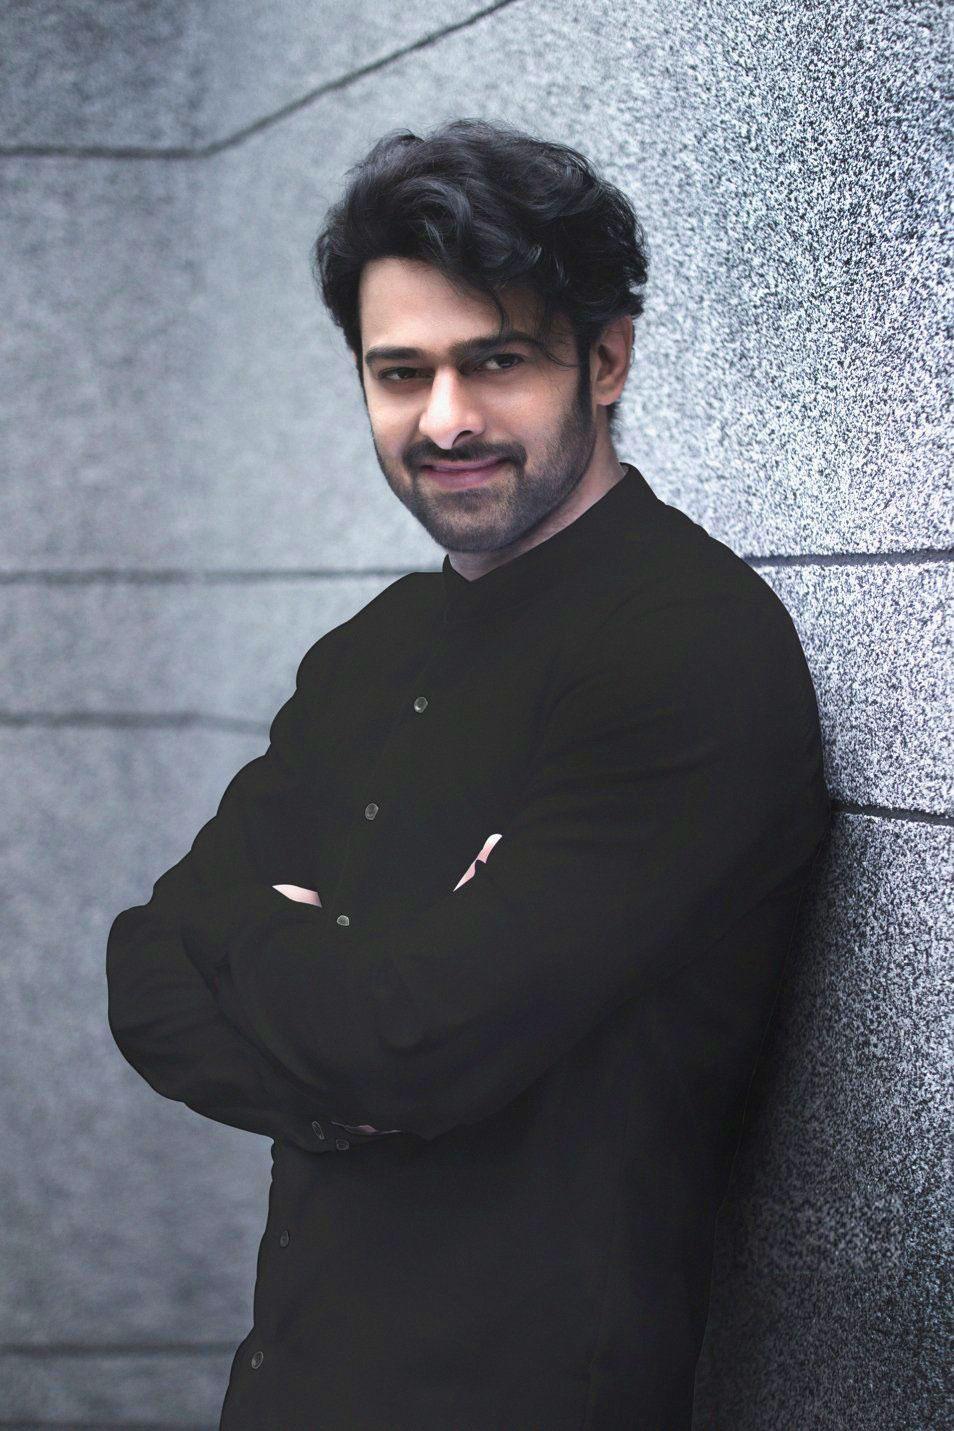 Stylish Superstar Prabhas Images wallpaper free hd